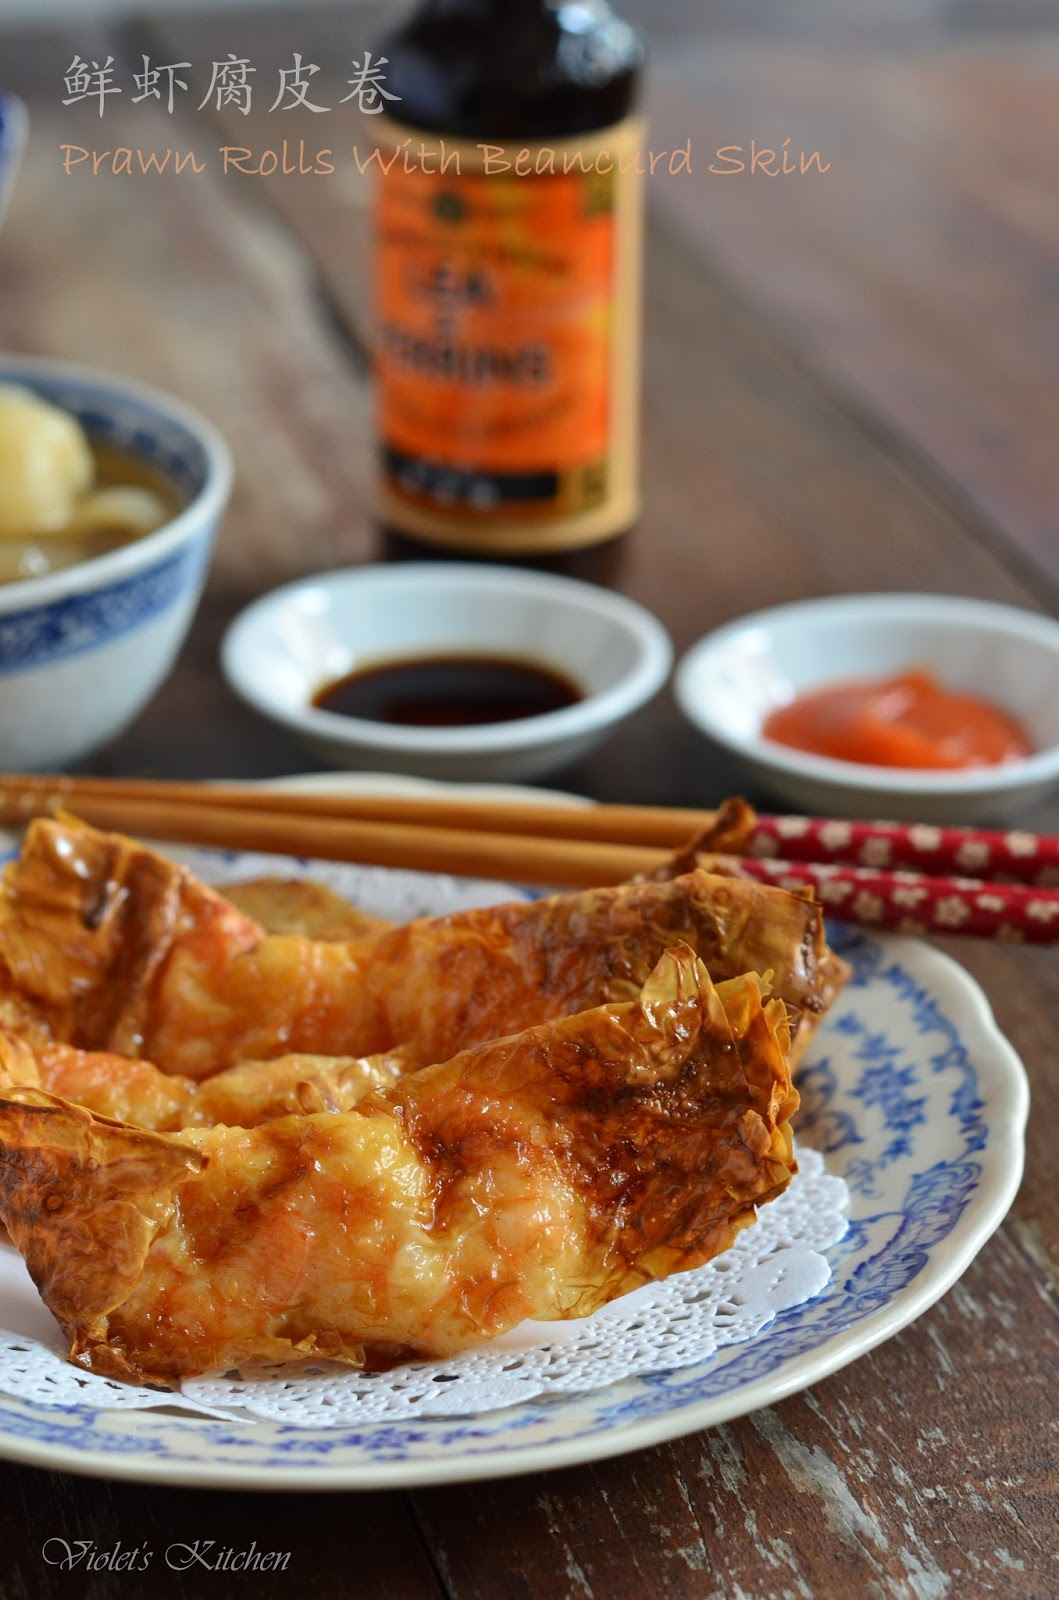 kitchen fryer ikea plates violet's ~♥紫羅蘭的爱心厨房♥~ : 鲜虾腐皮卷 prawn rolls with ...